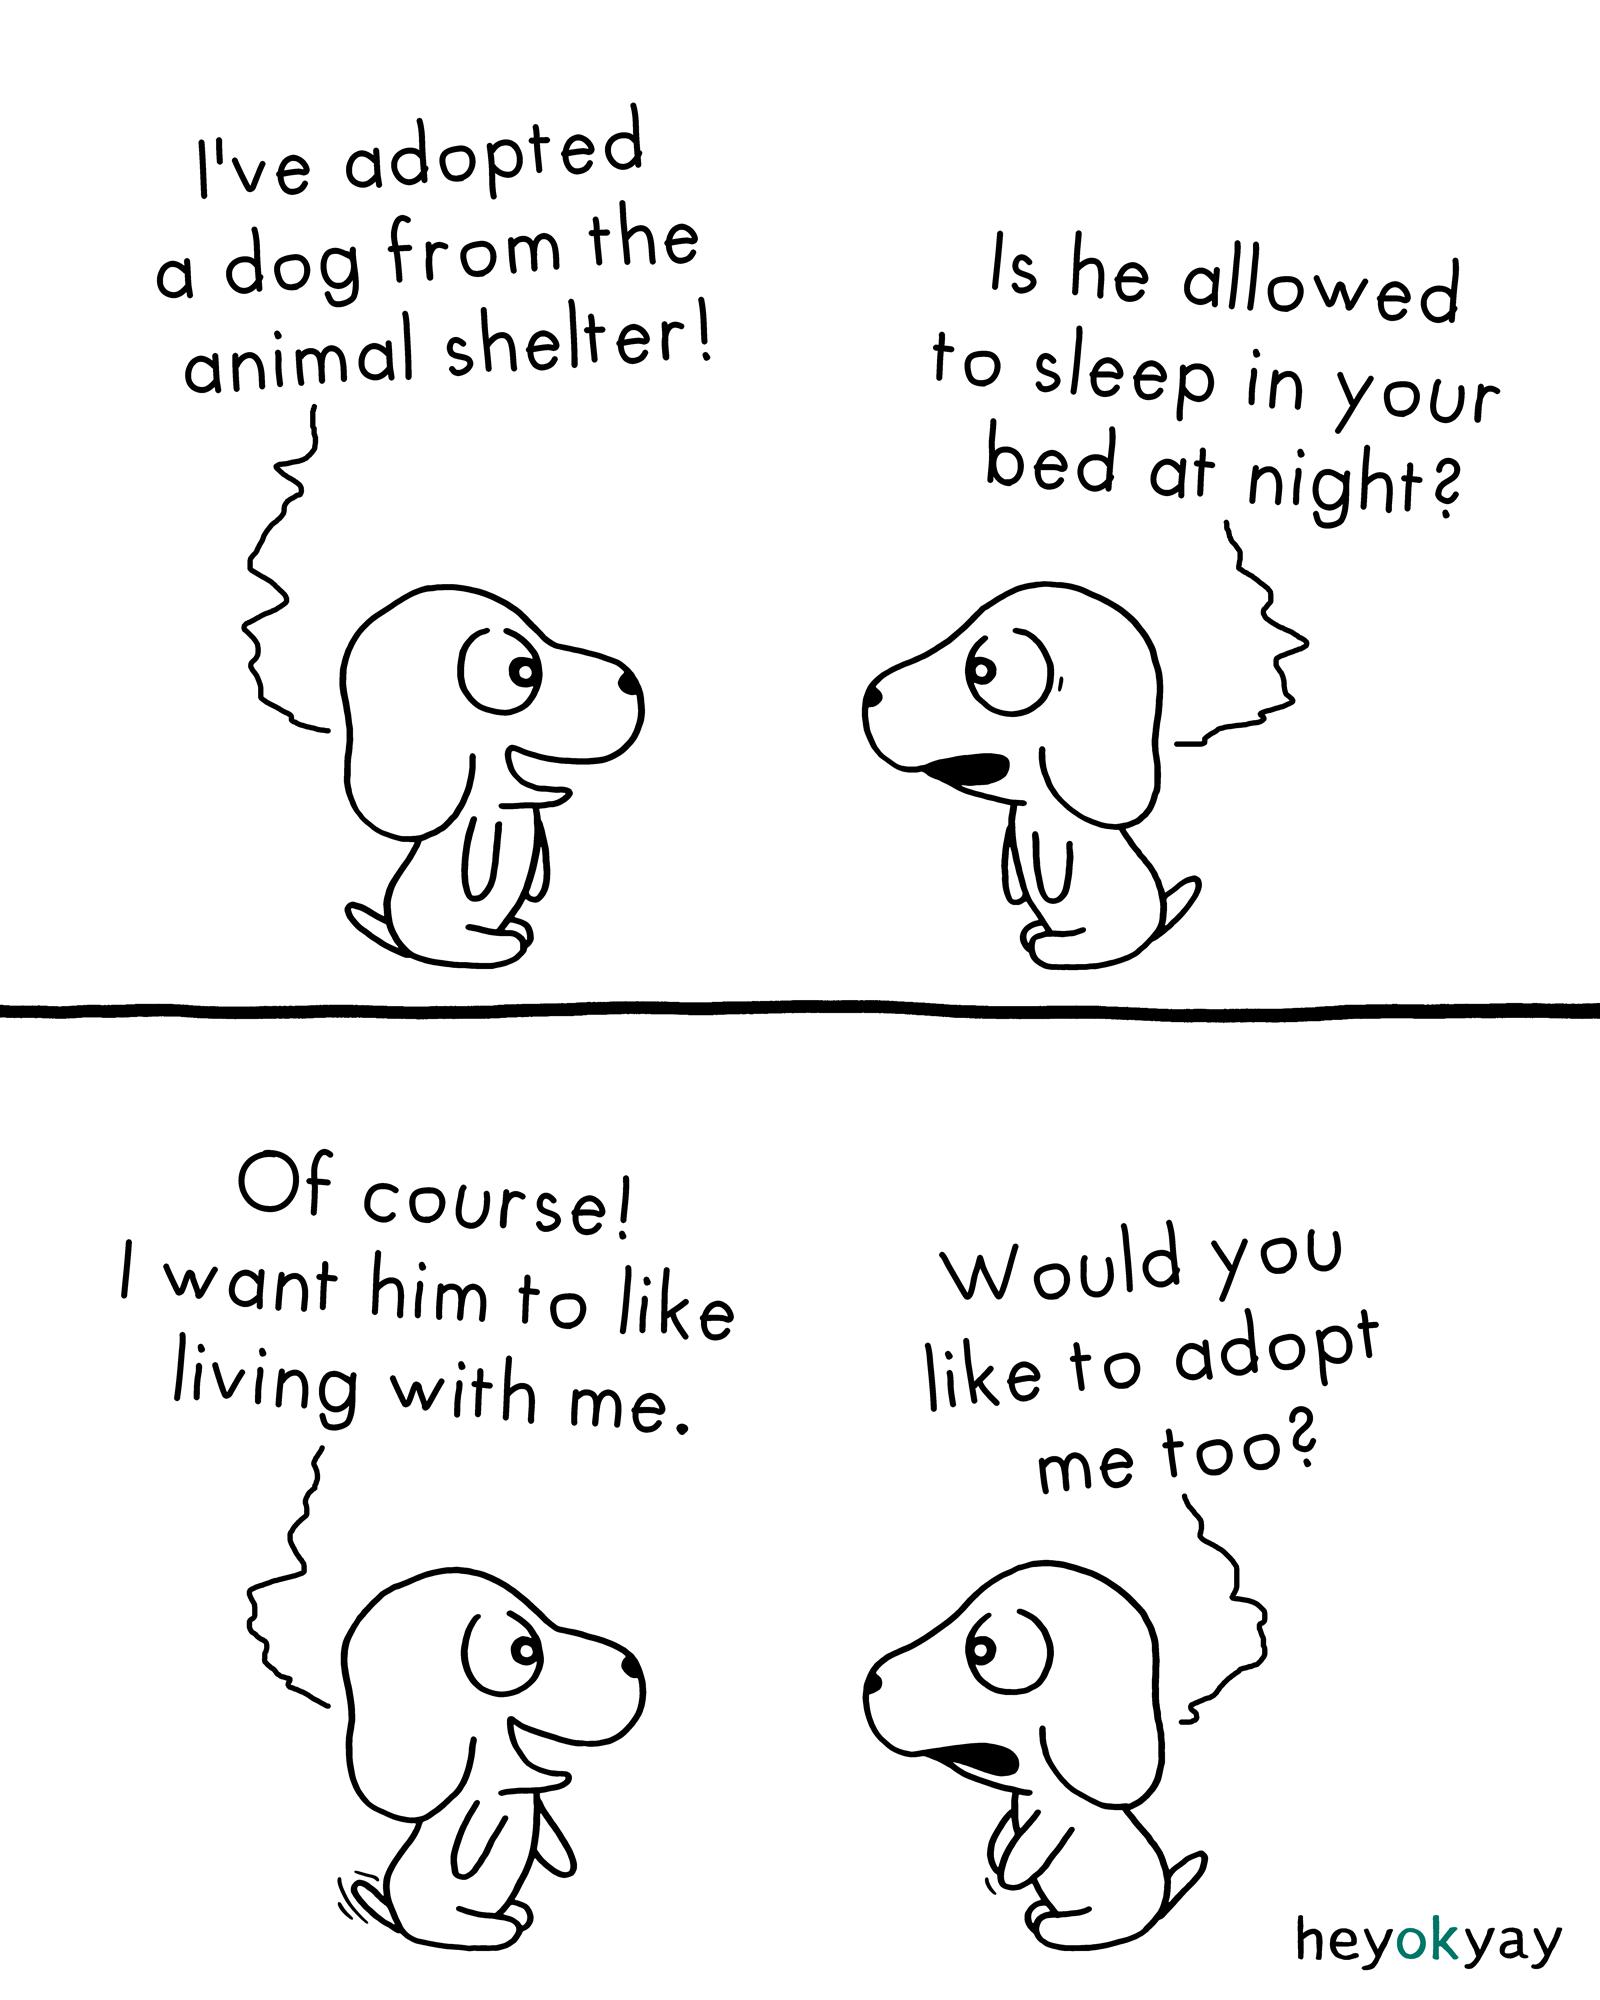 Adoption heyokyay comic